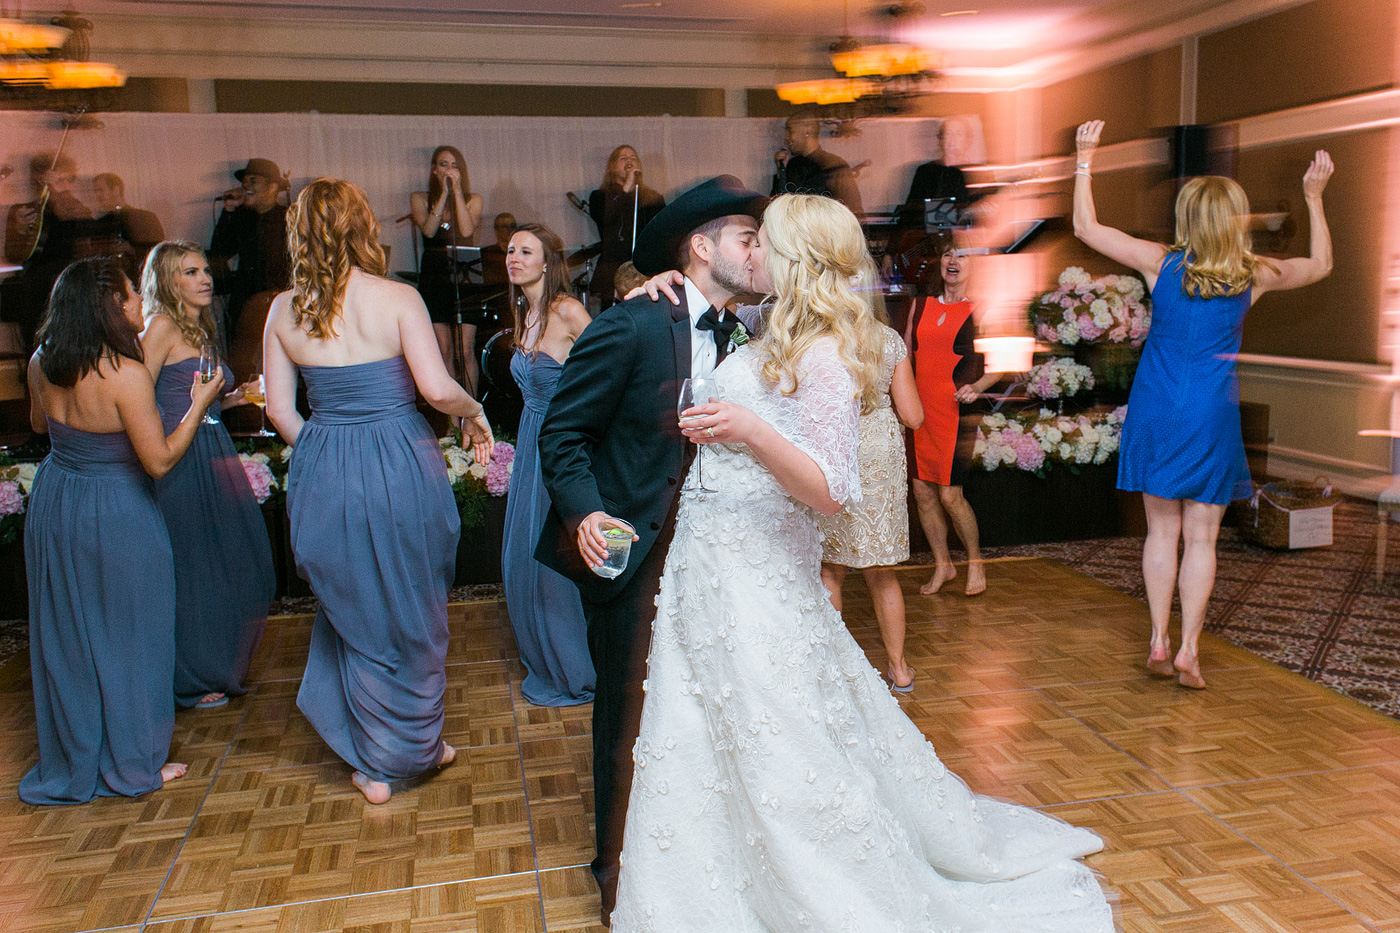 Inn-Rancho-Santa-Fe-Wedding-44